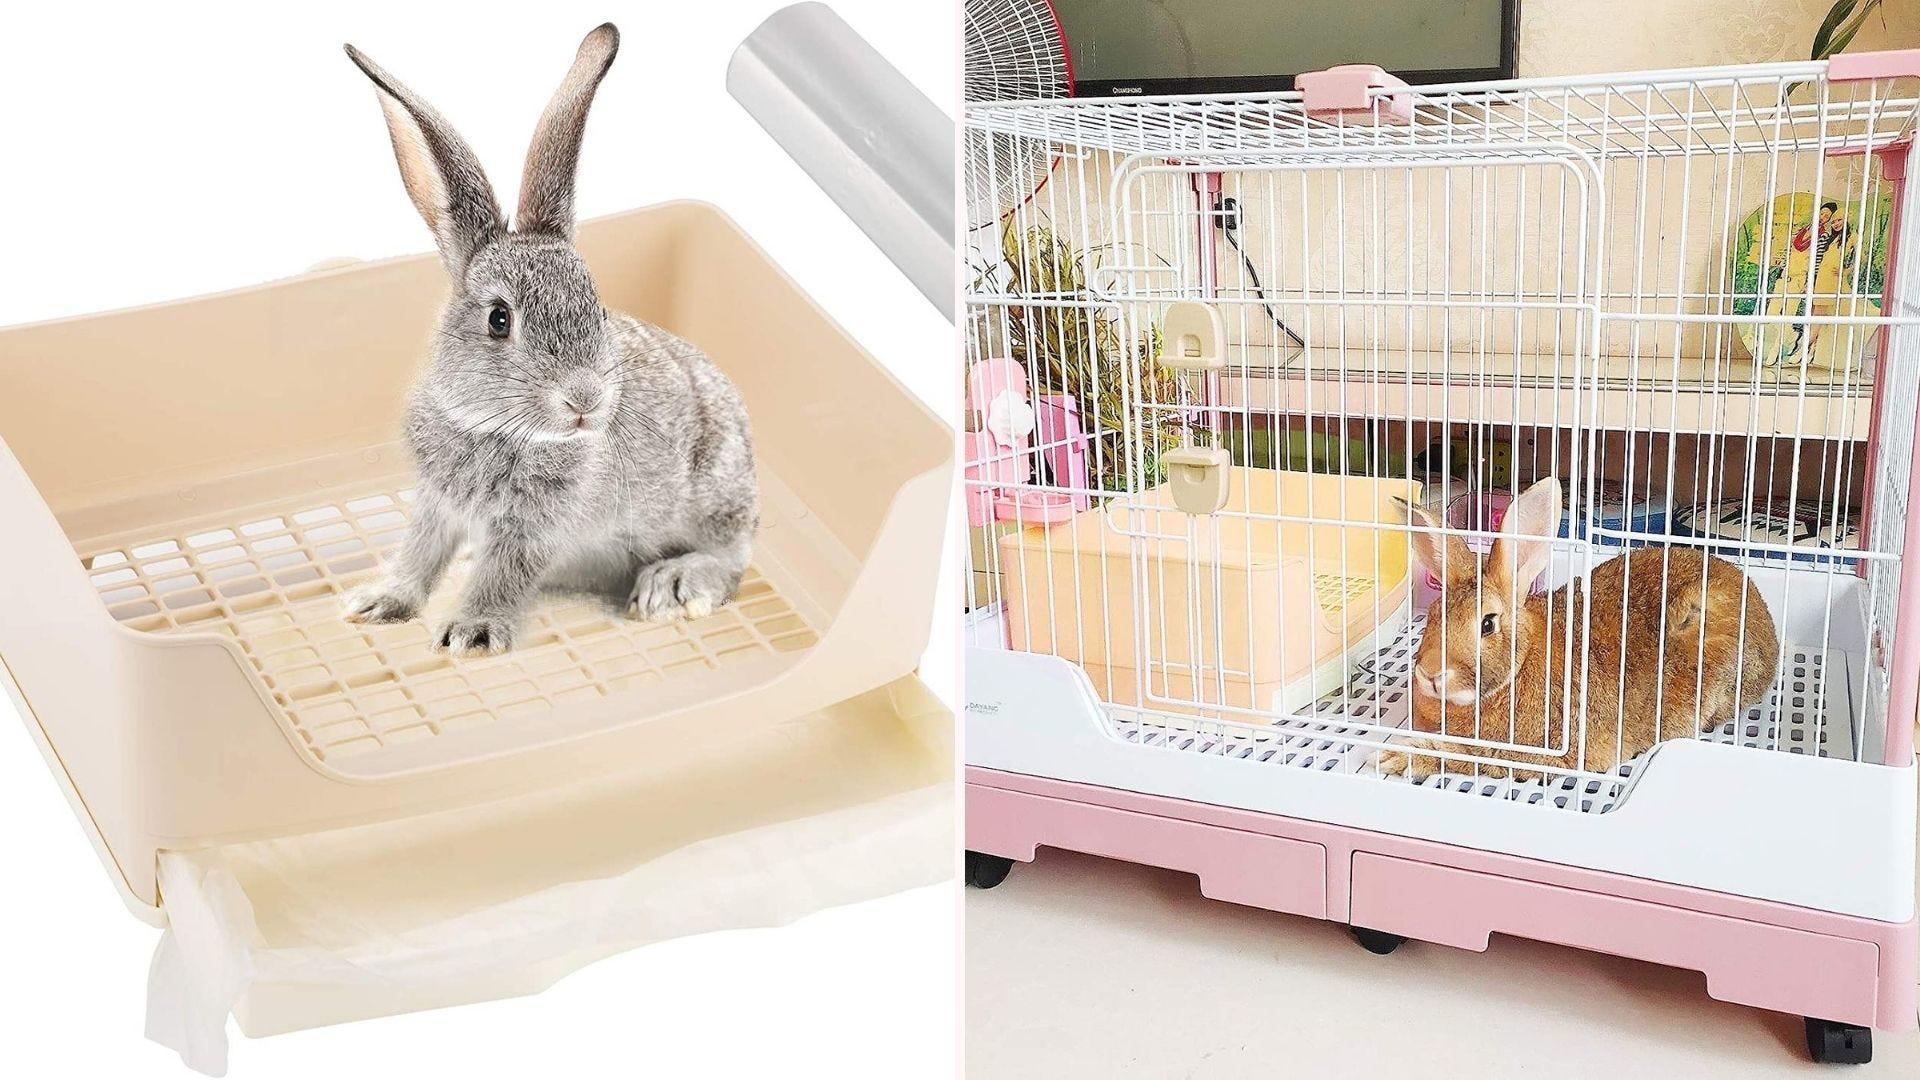 Rabbit using a bunny litter box.